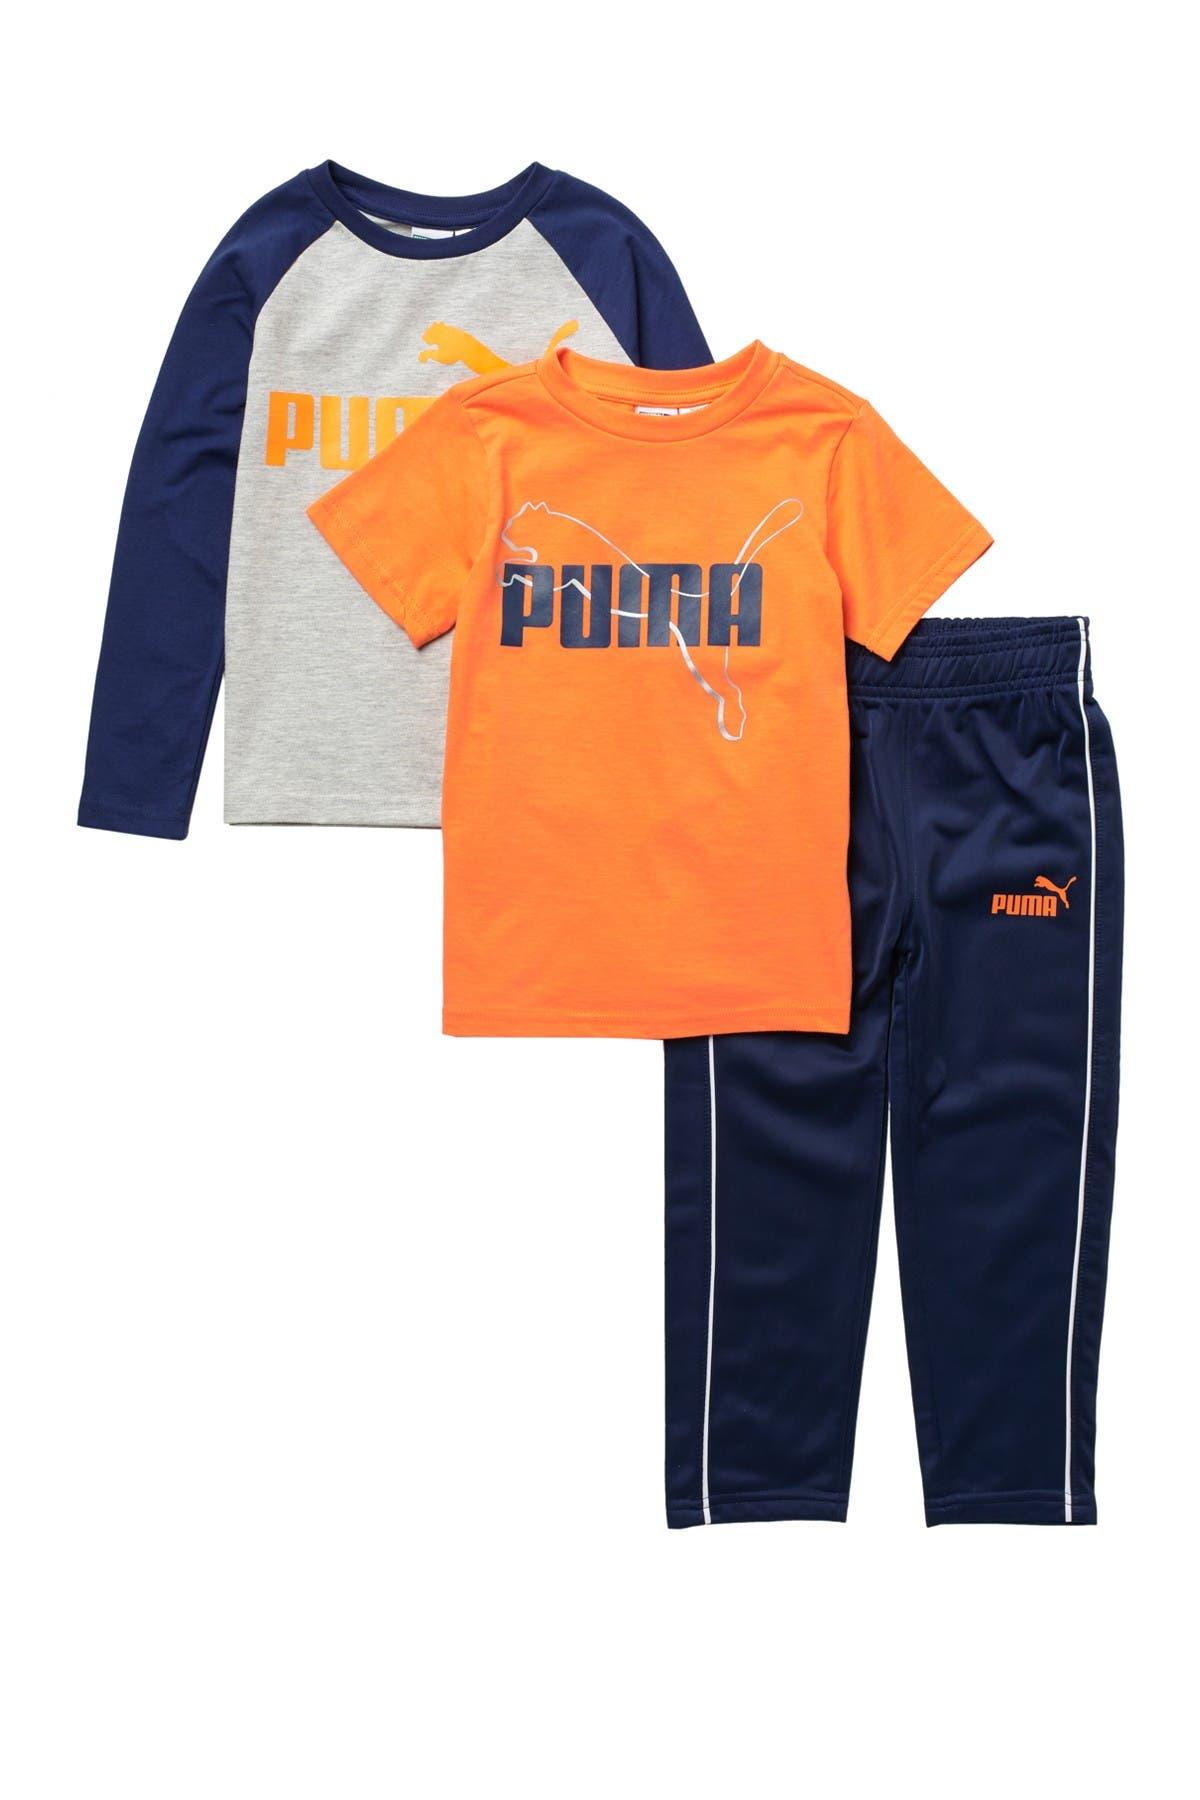 Image of PUMA Jersey 3-Piece T-Shirt & Pants Set